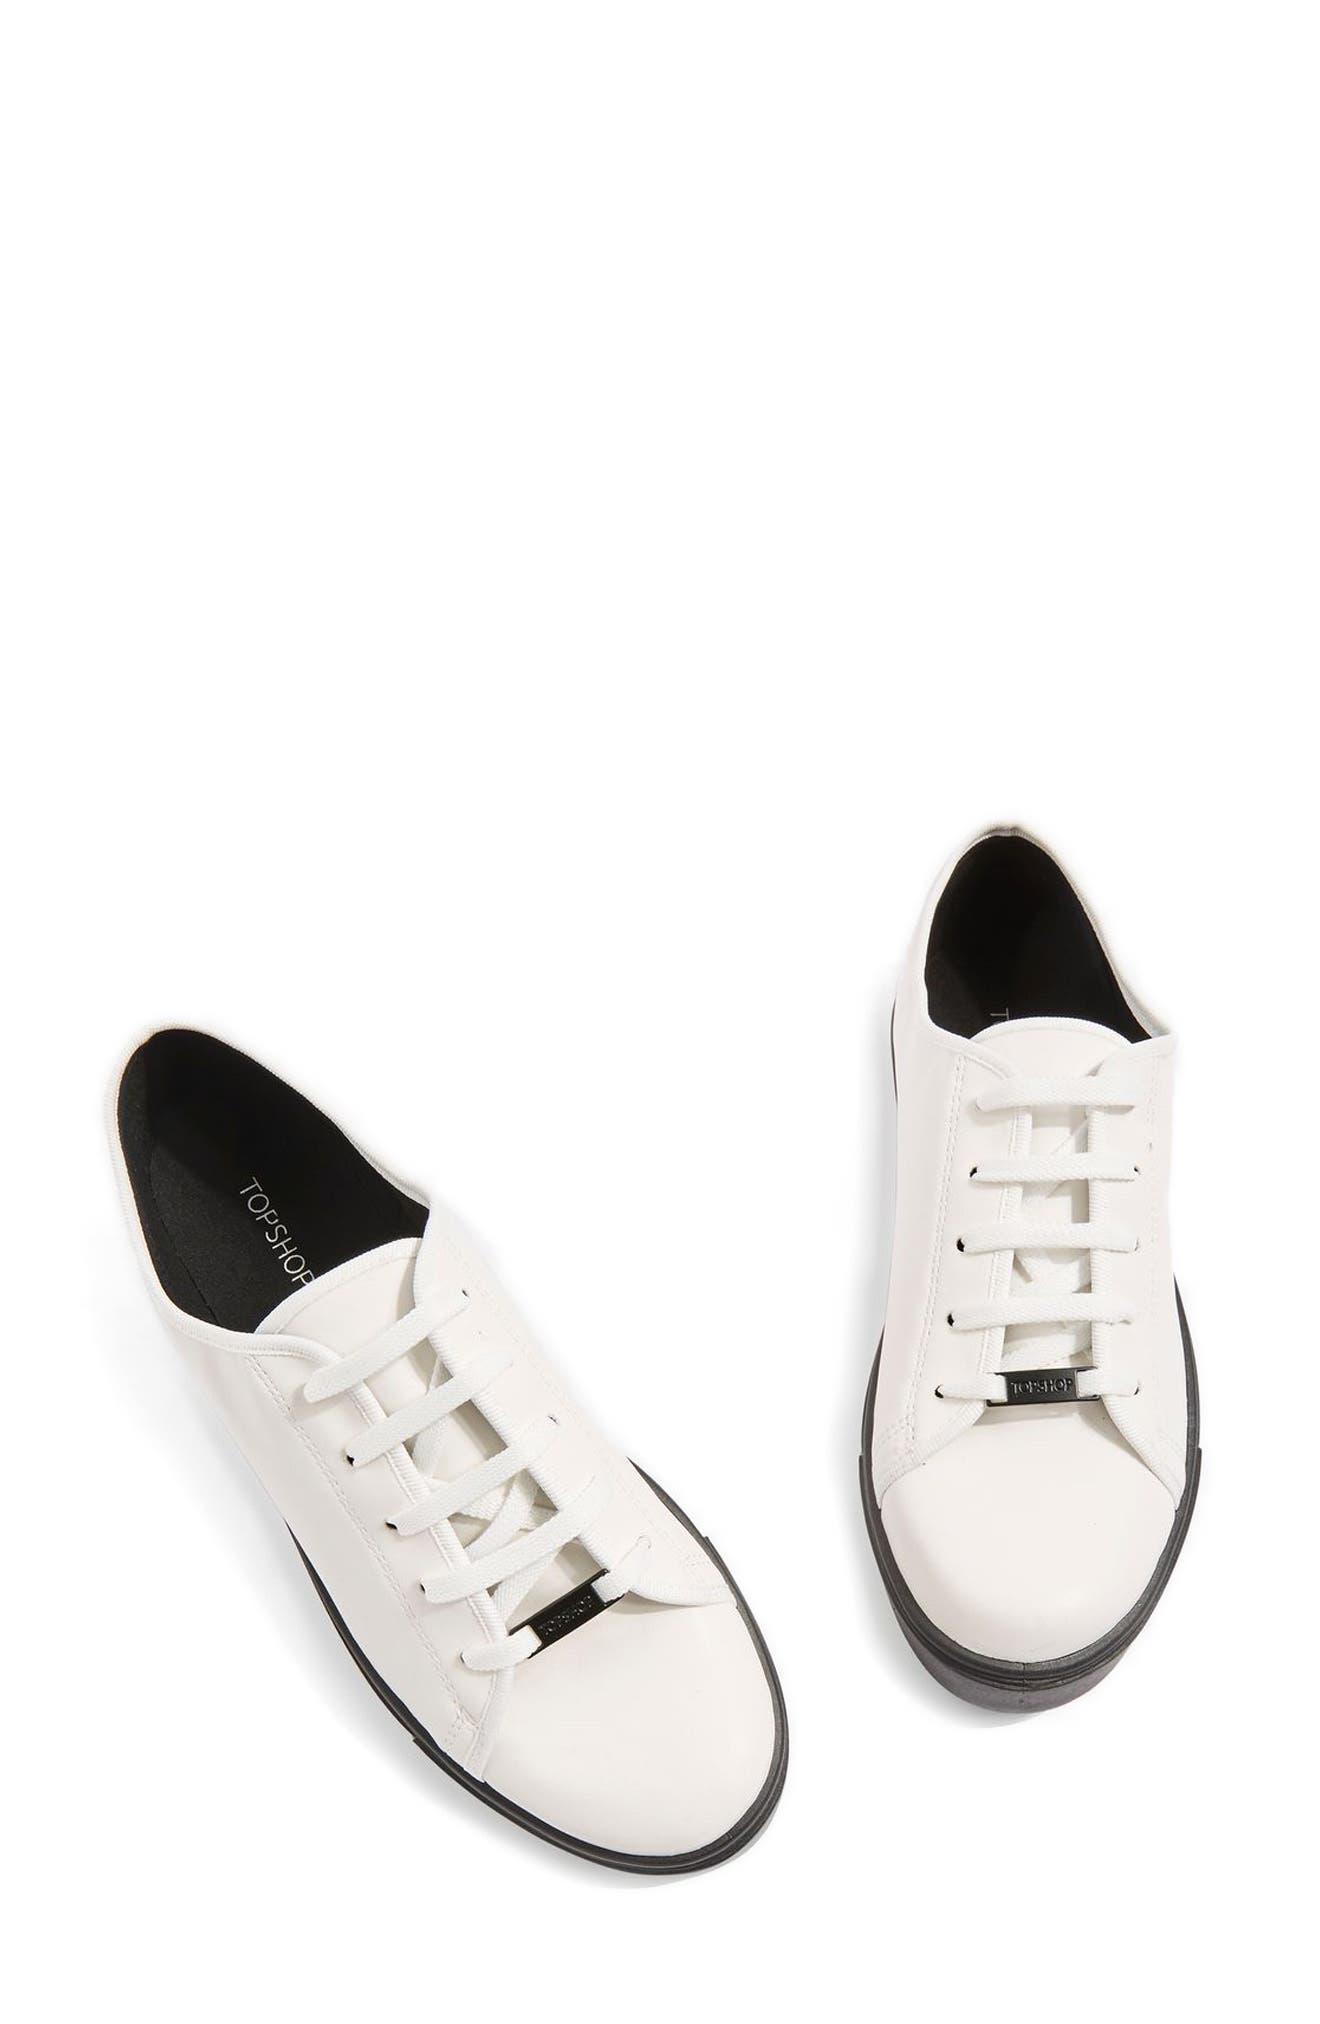 Crush Waterproof Contrast Sole Sneaker,                         Main,                         color, 001